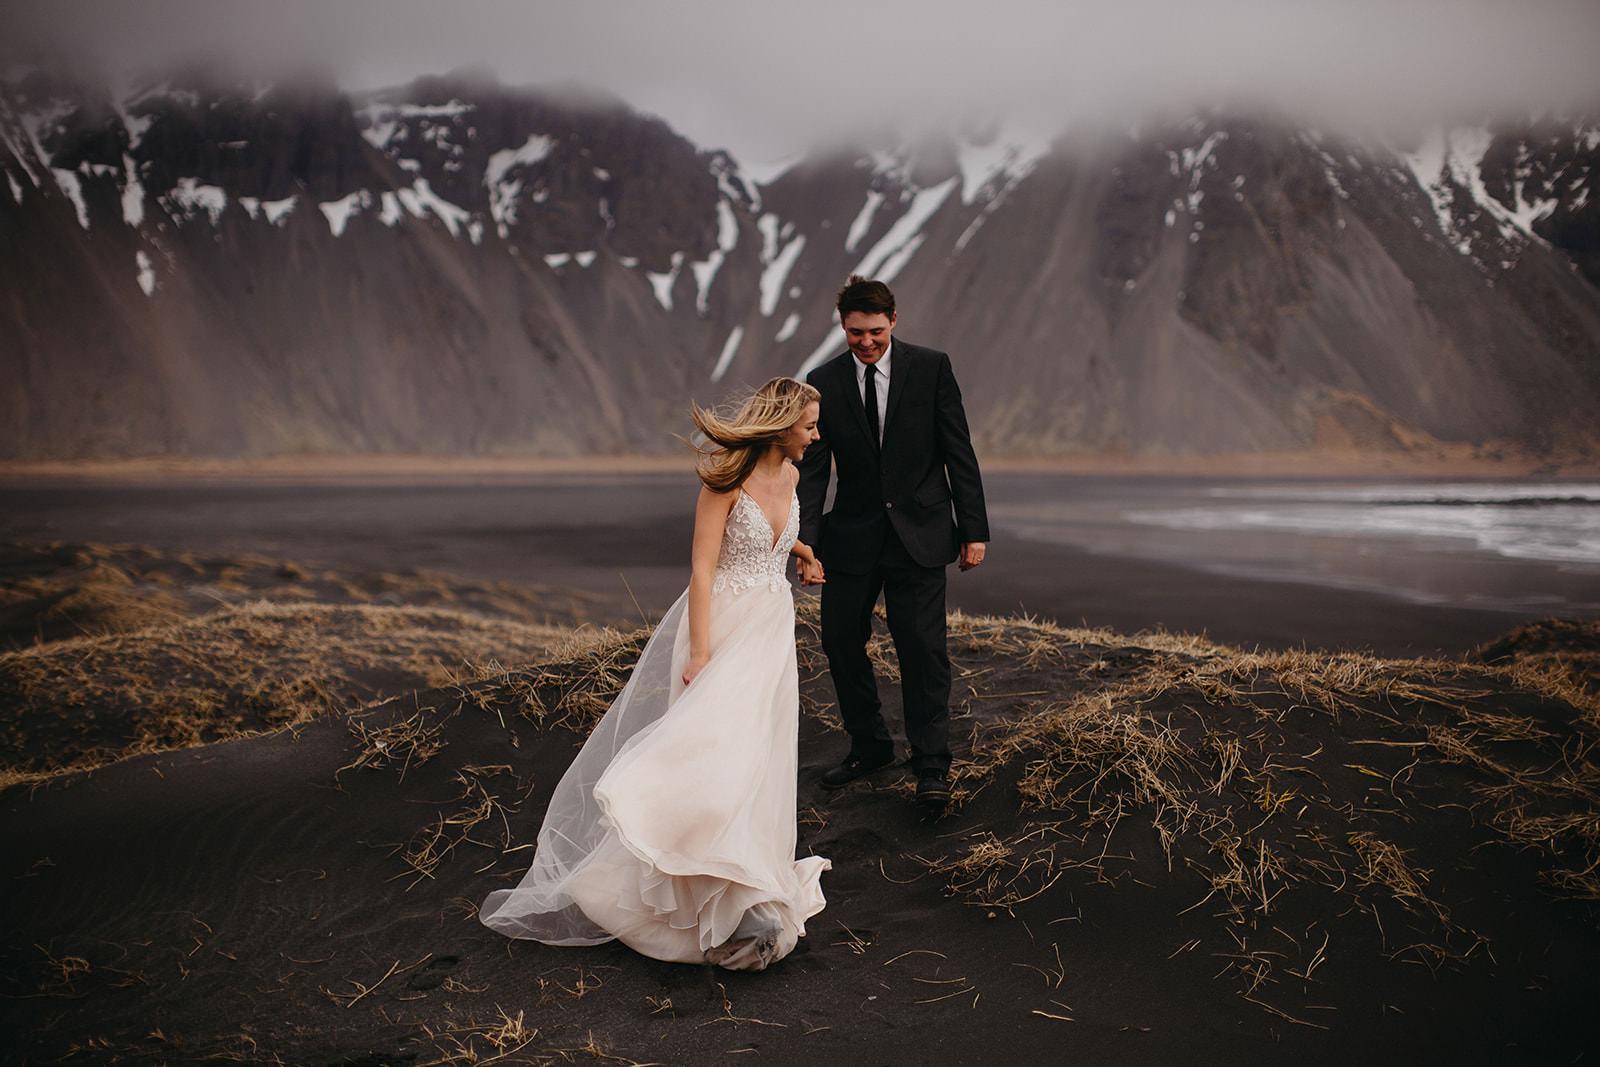 Icelandic Iceland Elopement Wedding Elope Photographer Eloping Reykjavík Vik Black Sand Beach Jökulsárlón Skogafoss Waterfall Vestrahorn Mountain Liz Osban Photography Destination 35.jpg